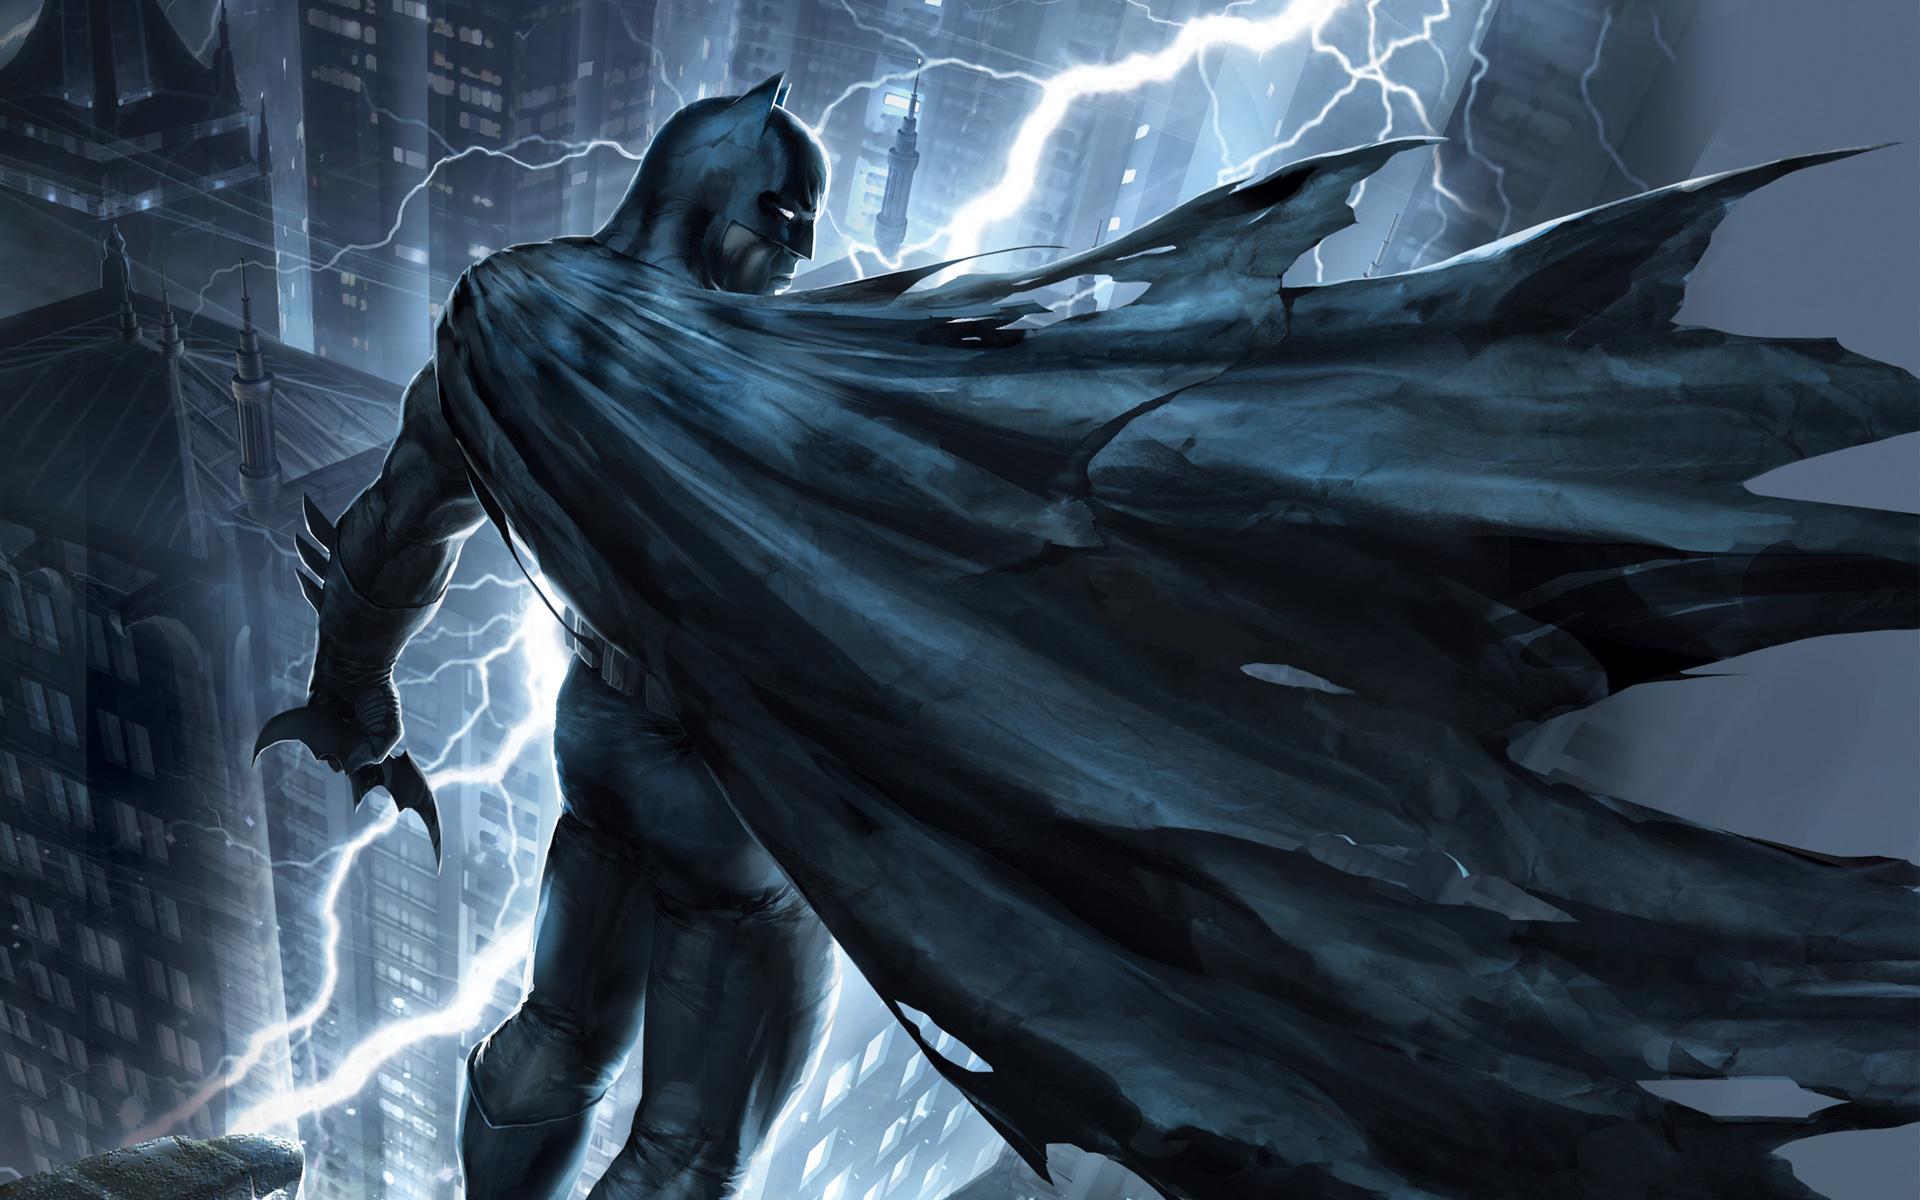 Batman The Dark Knight Returns Part 1 Movie Wallpapers HD Wallpapers 1920x1200